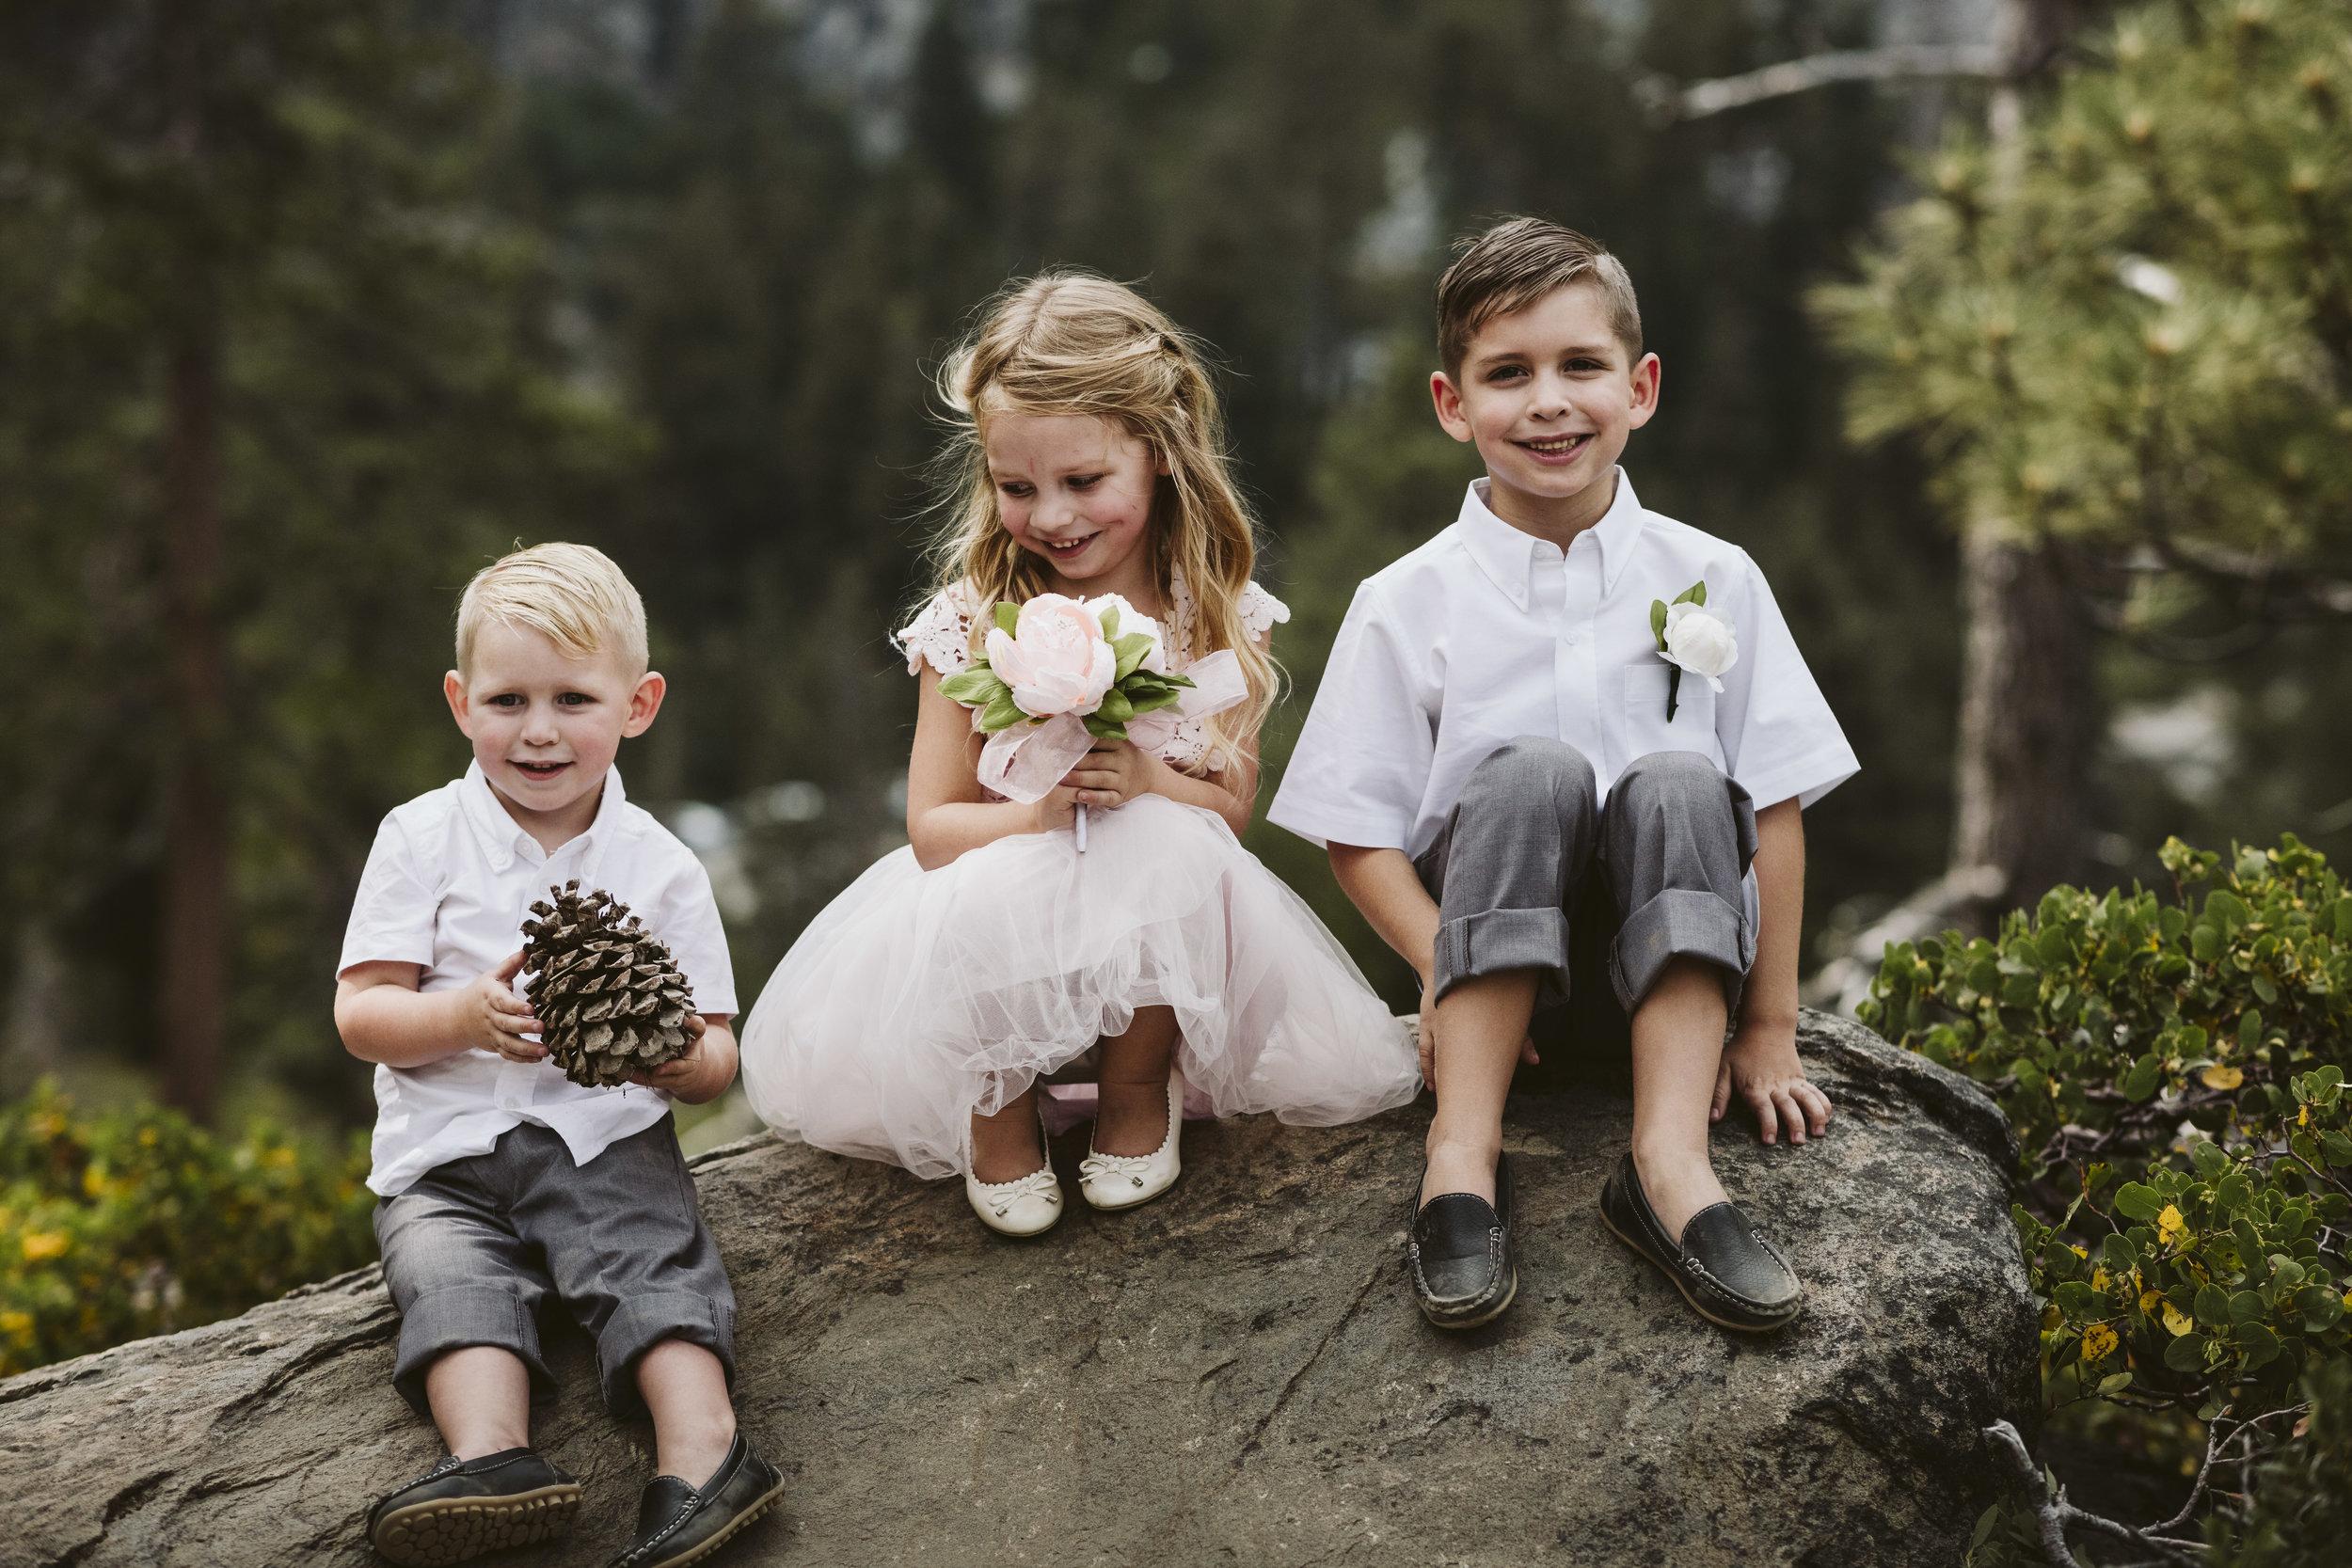 _P8A0360vildphotography-adventurewedding-adventurouswedding-tahoewedding-laketahoewedding-adventureelopement-laketahoeweddingphotographer-wedding-photographer-weddingphotographer-Chase-Sam.jpg